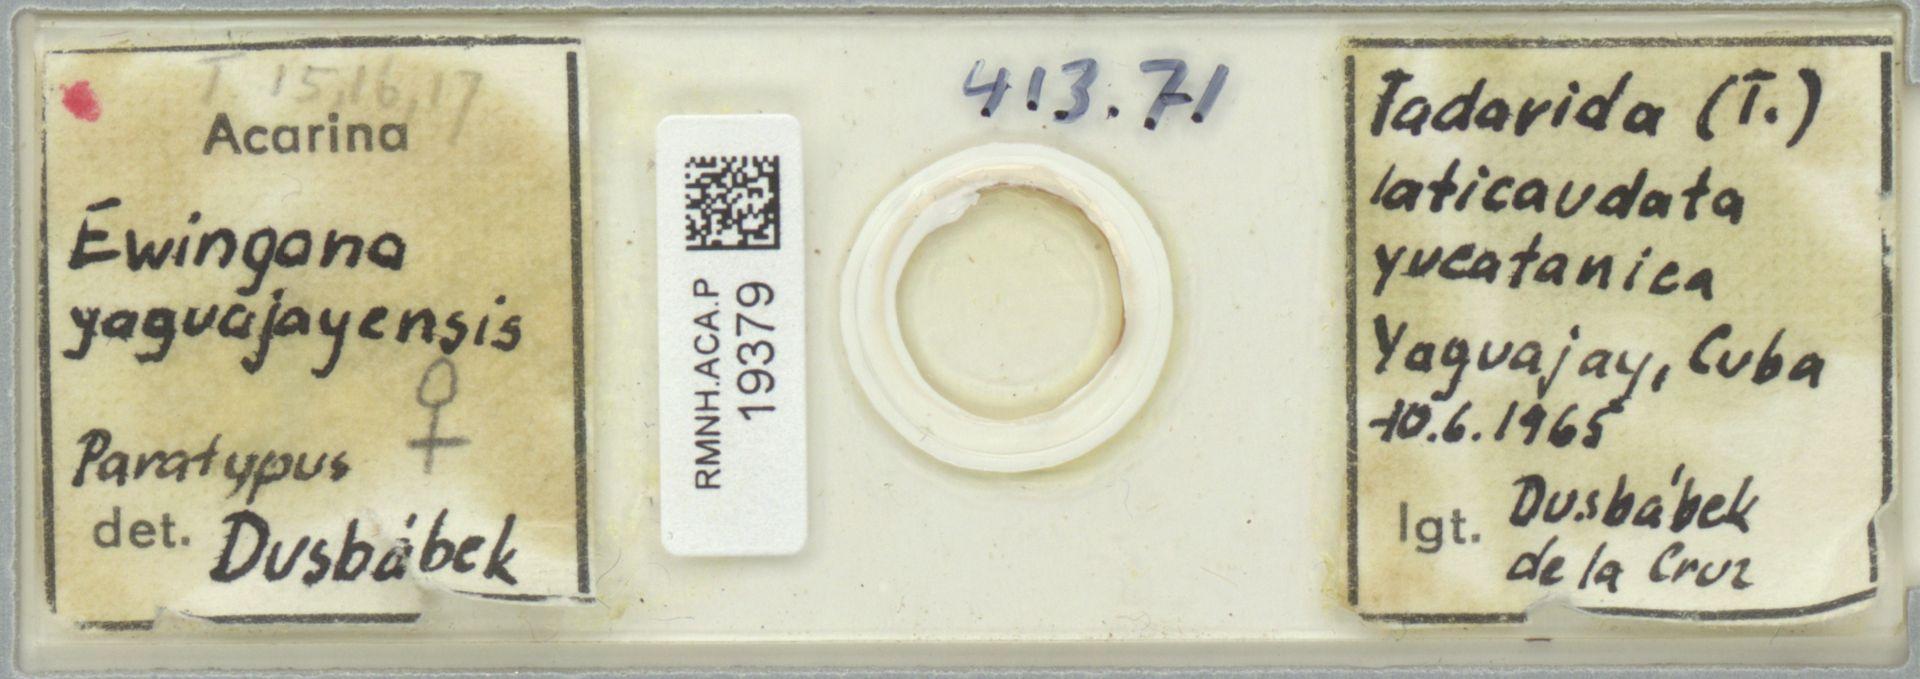 RMNH.ACA.P.19379 | Ewingana yaguajayensis